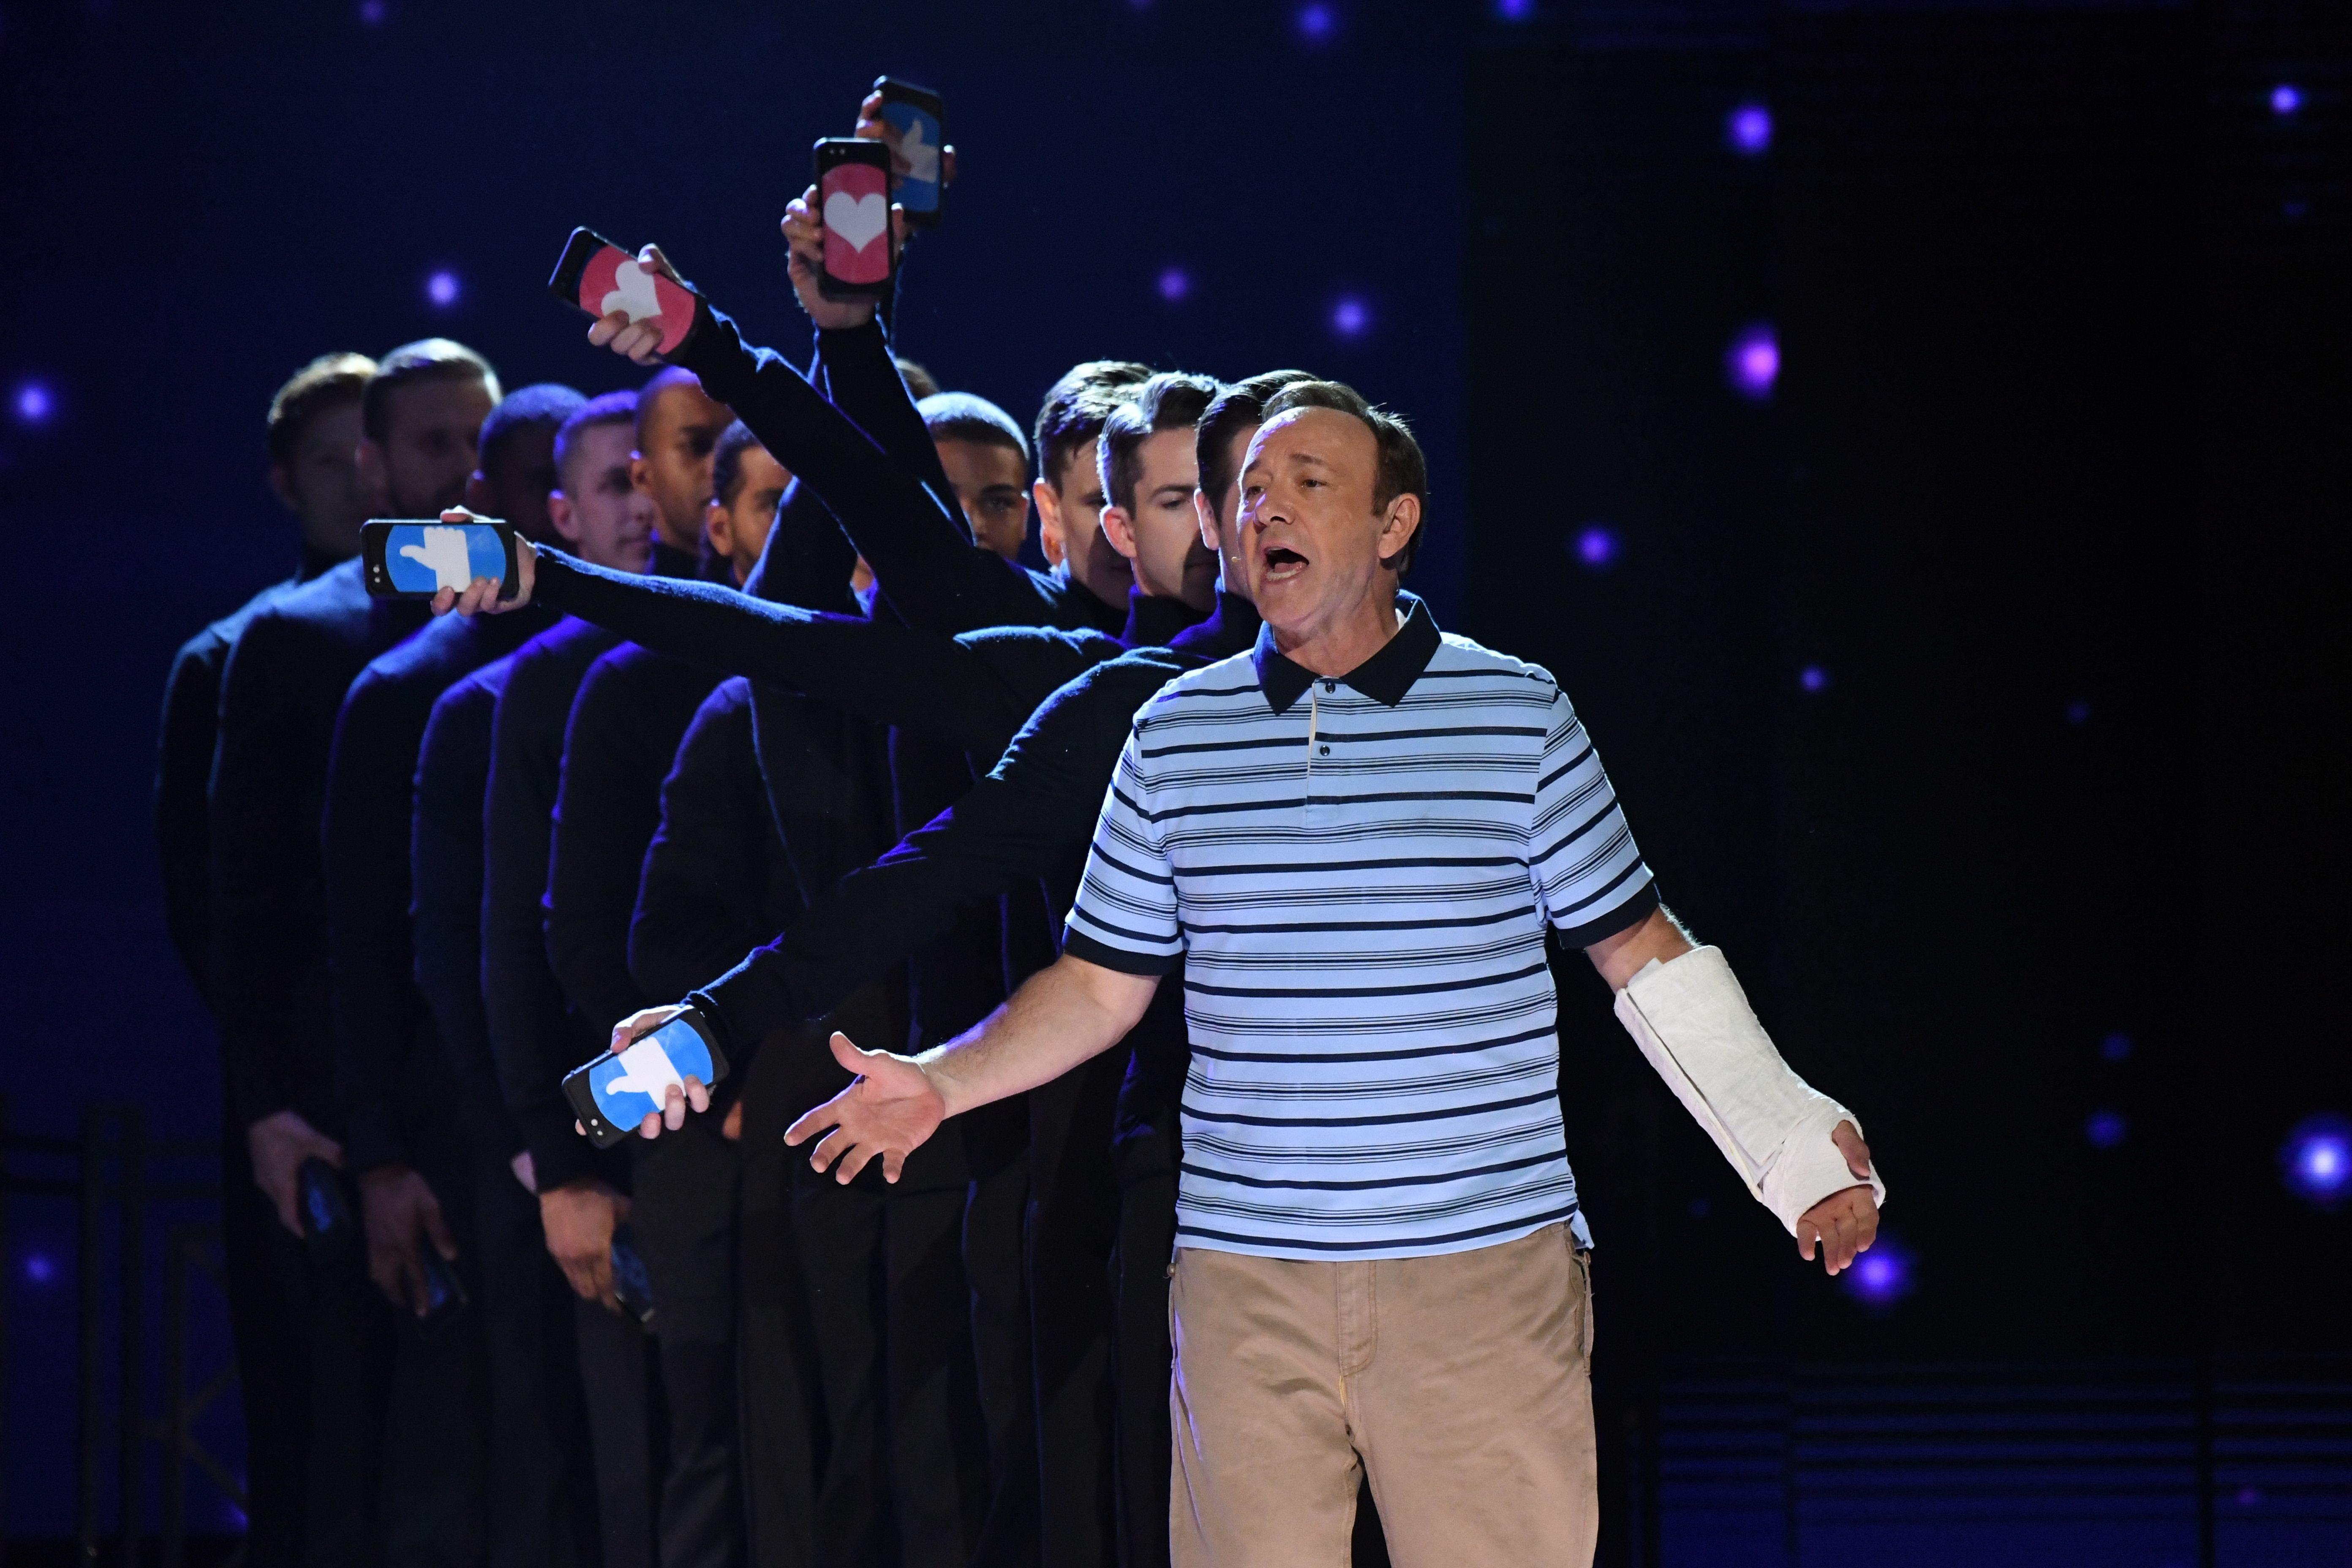 Jun 11, 2017; New York, NY, USA; Kevin Spacey performs